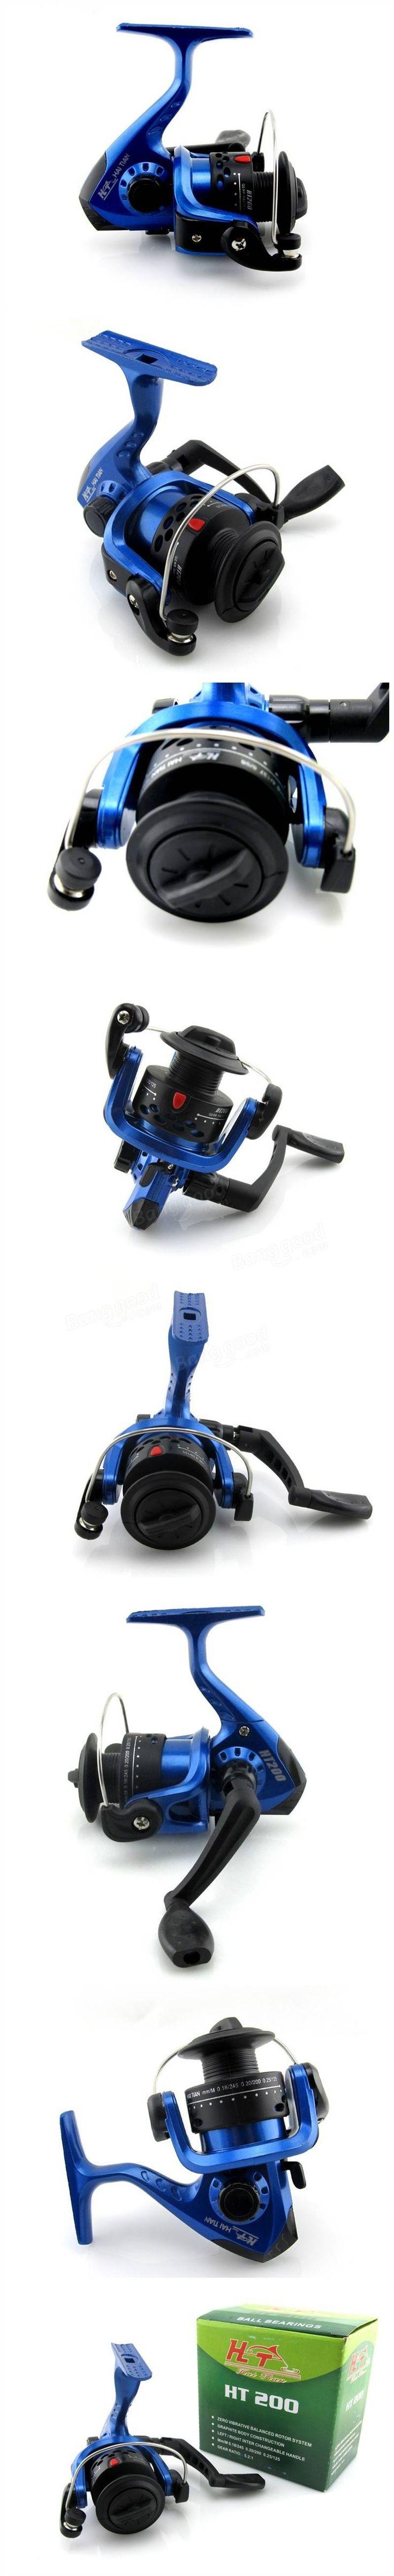 Seaknight HT200 Spinning Fishing Reel Bearings 1BB Gear Ratio 5.2:1 Left/Right Hand